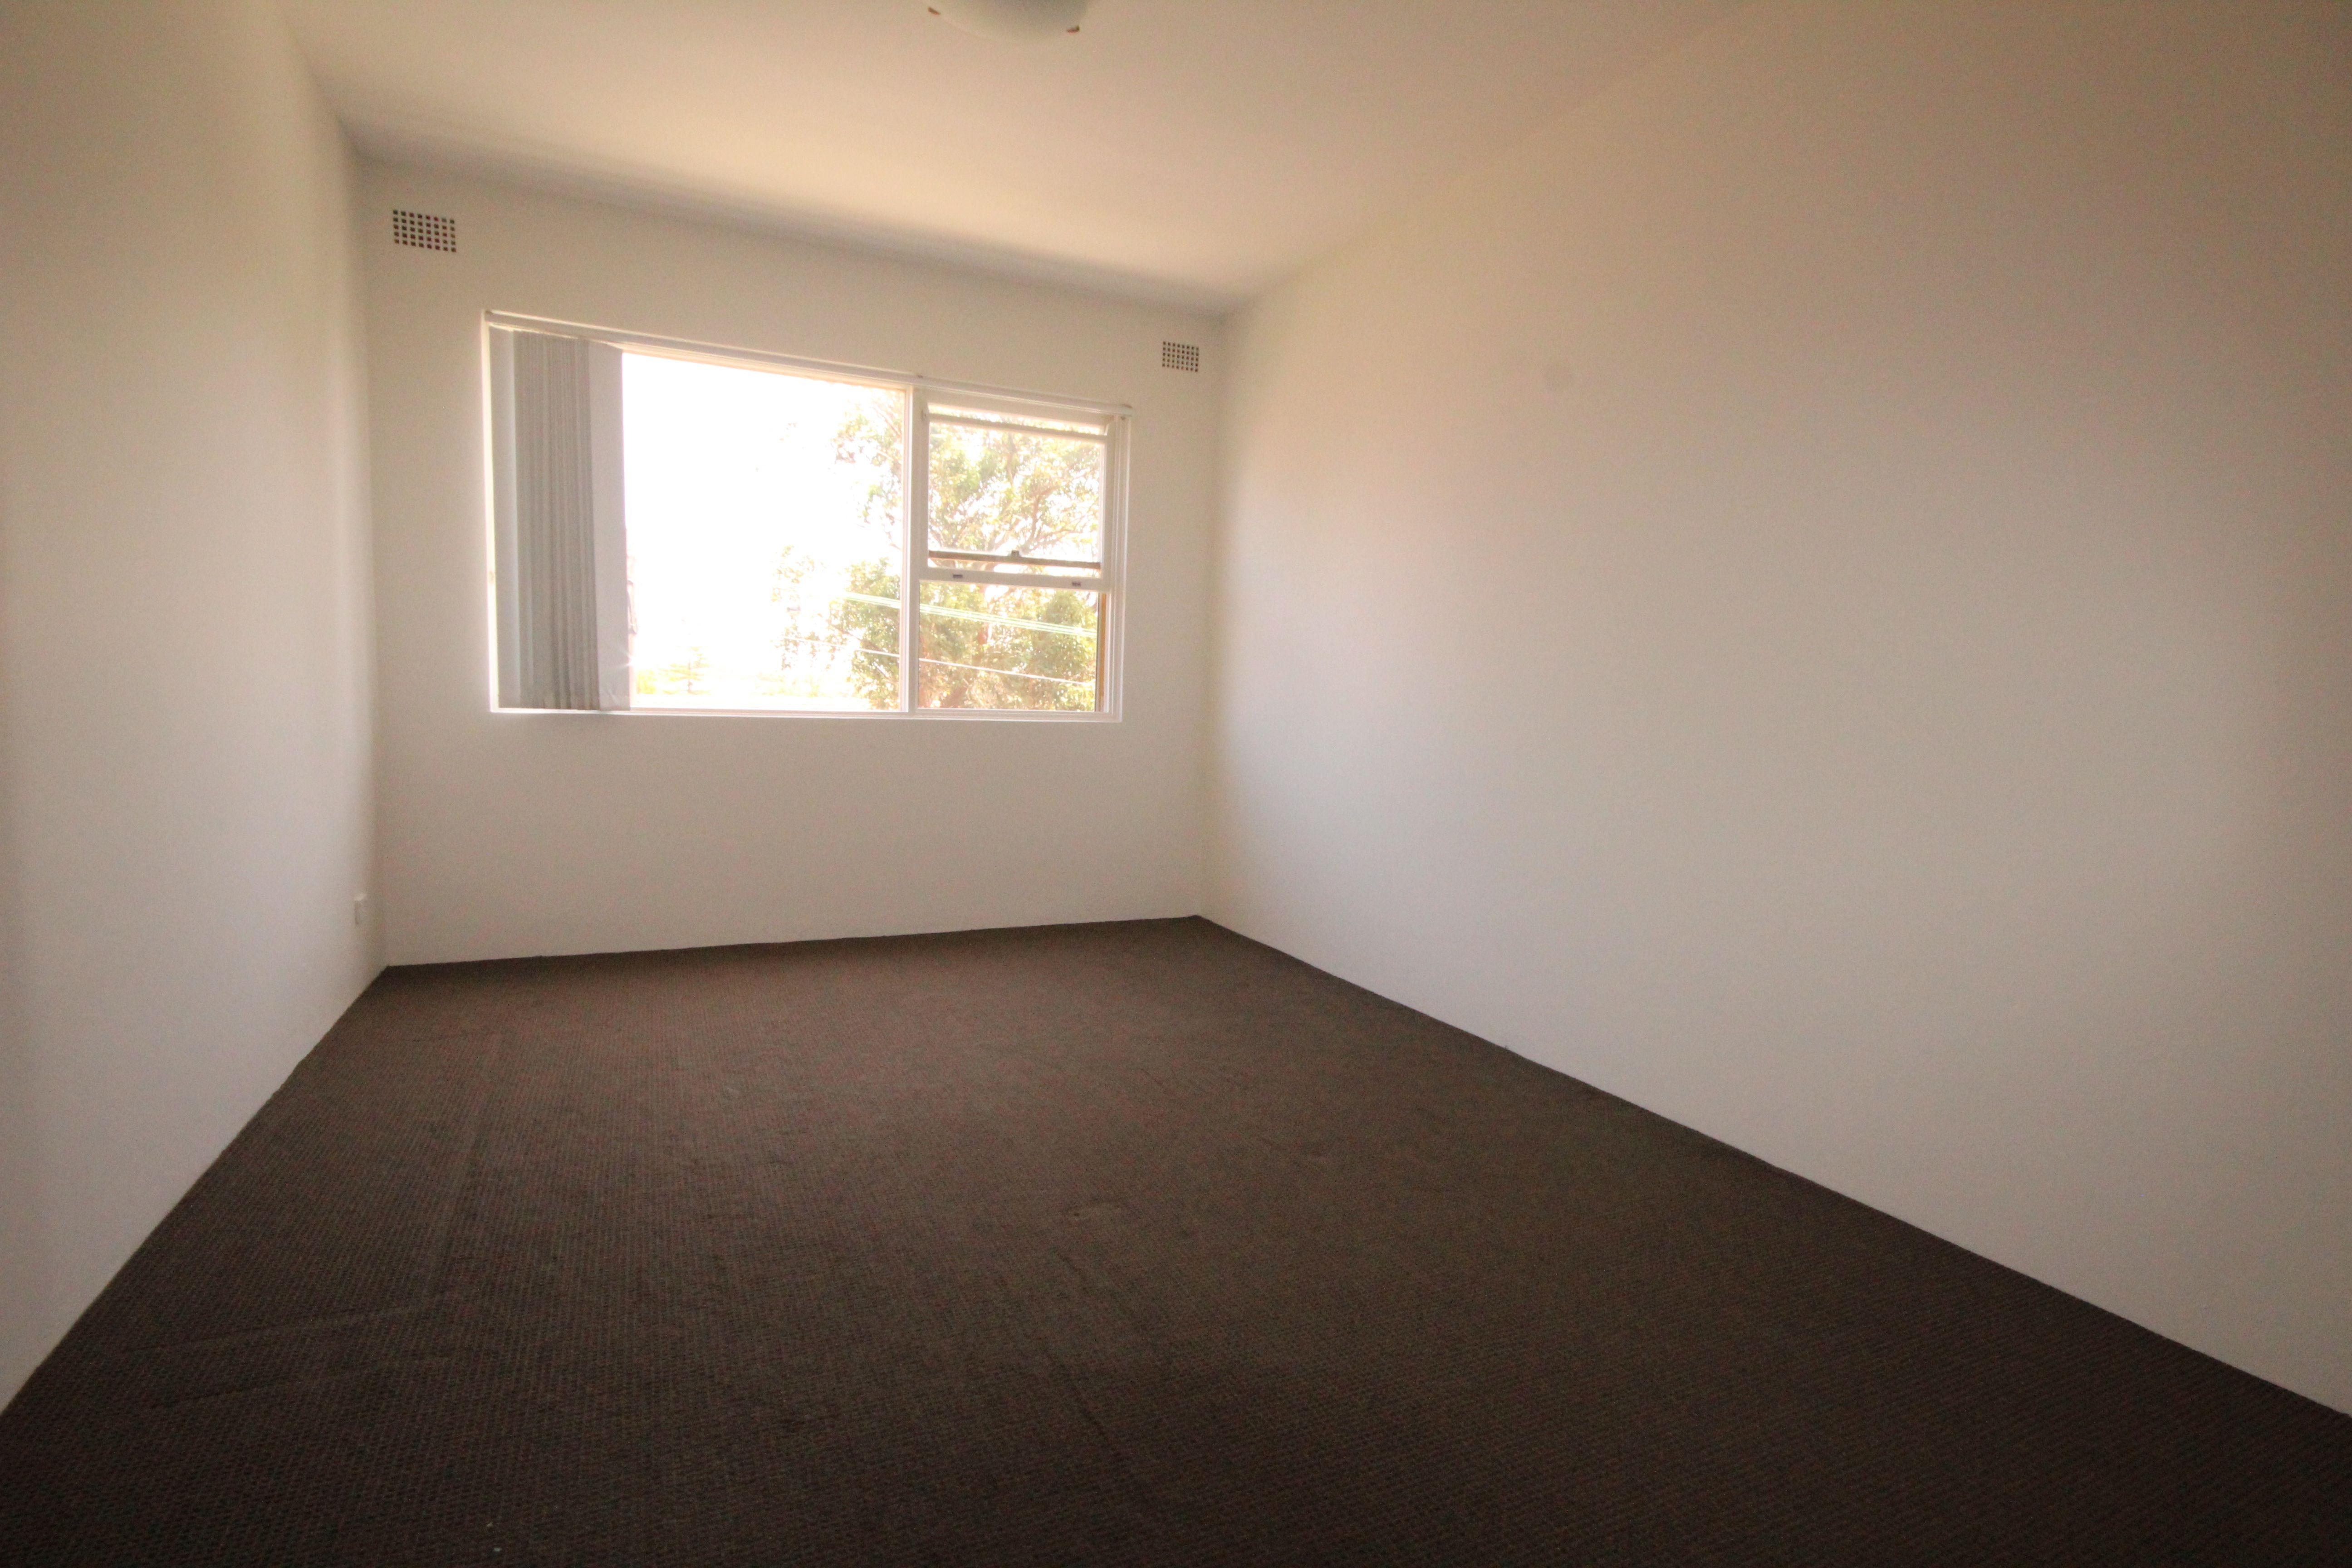 8/1-3 Therry Street, Strathfield South NSW 2136